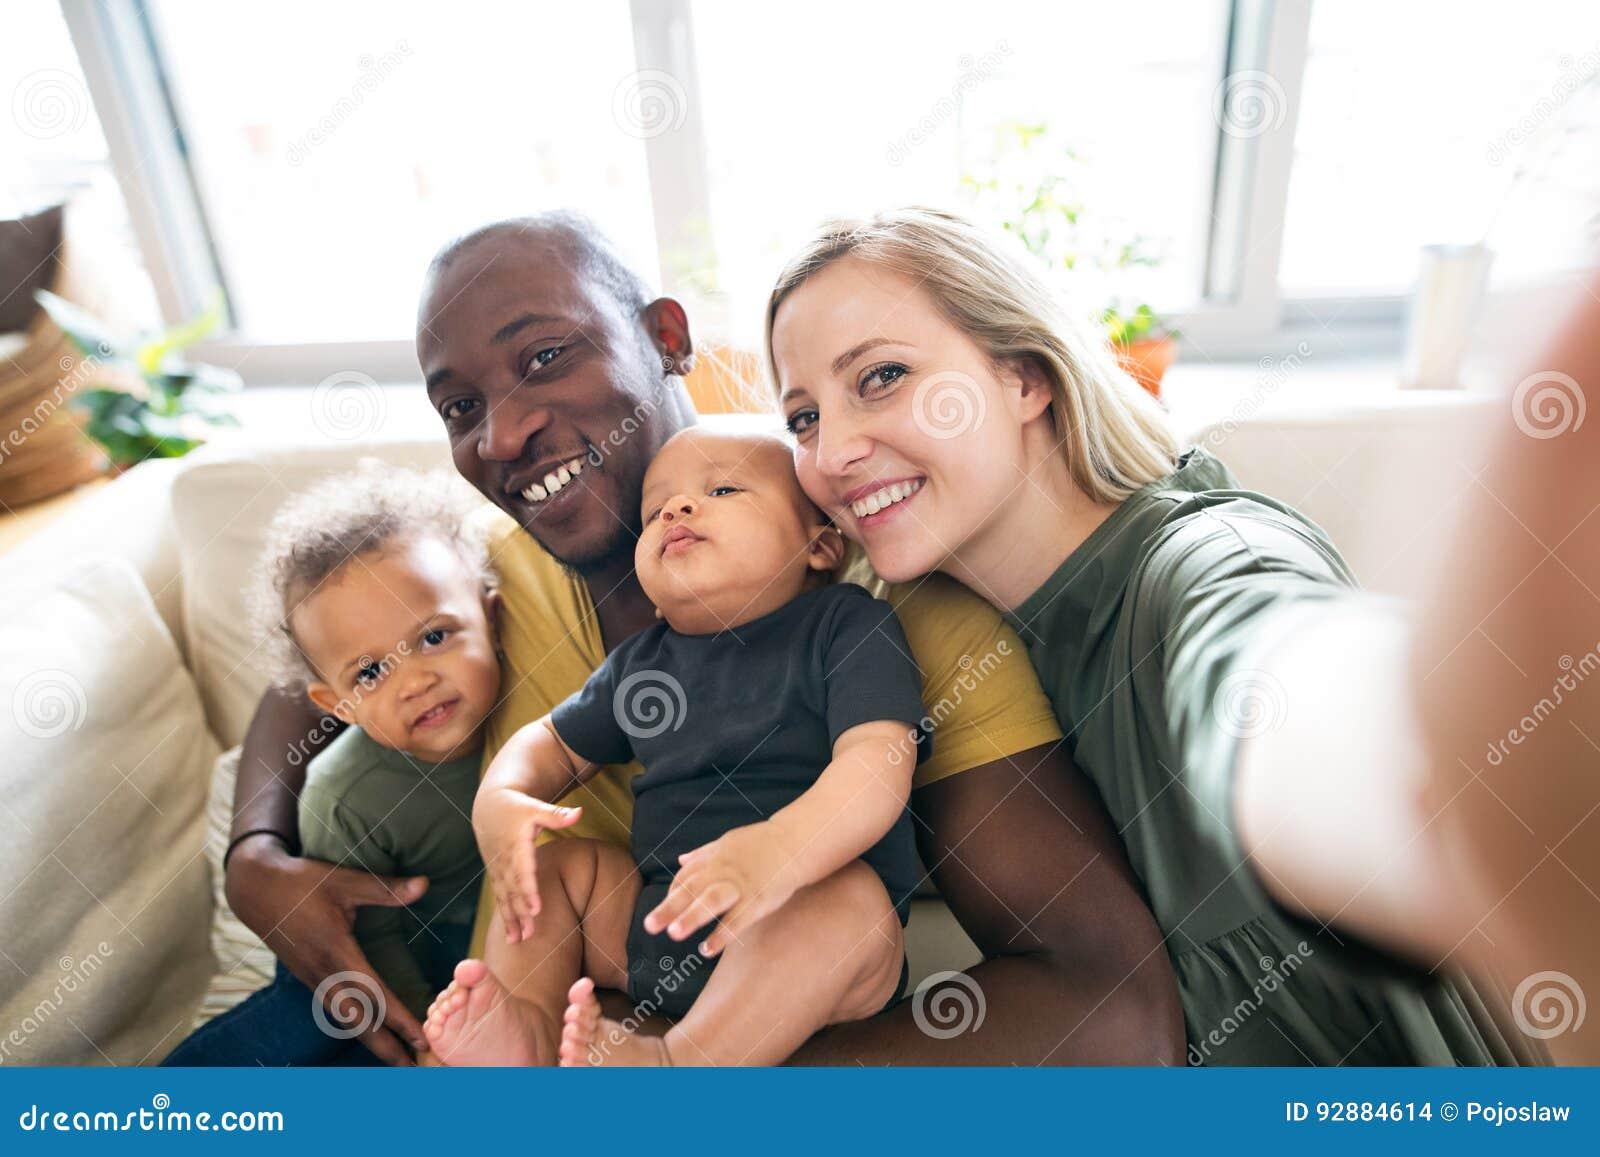 Free interracial message boards